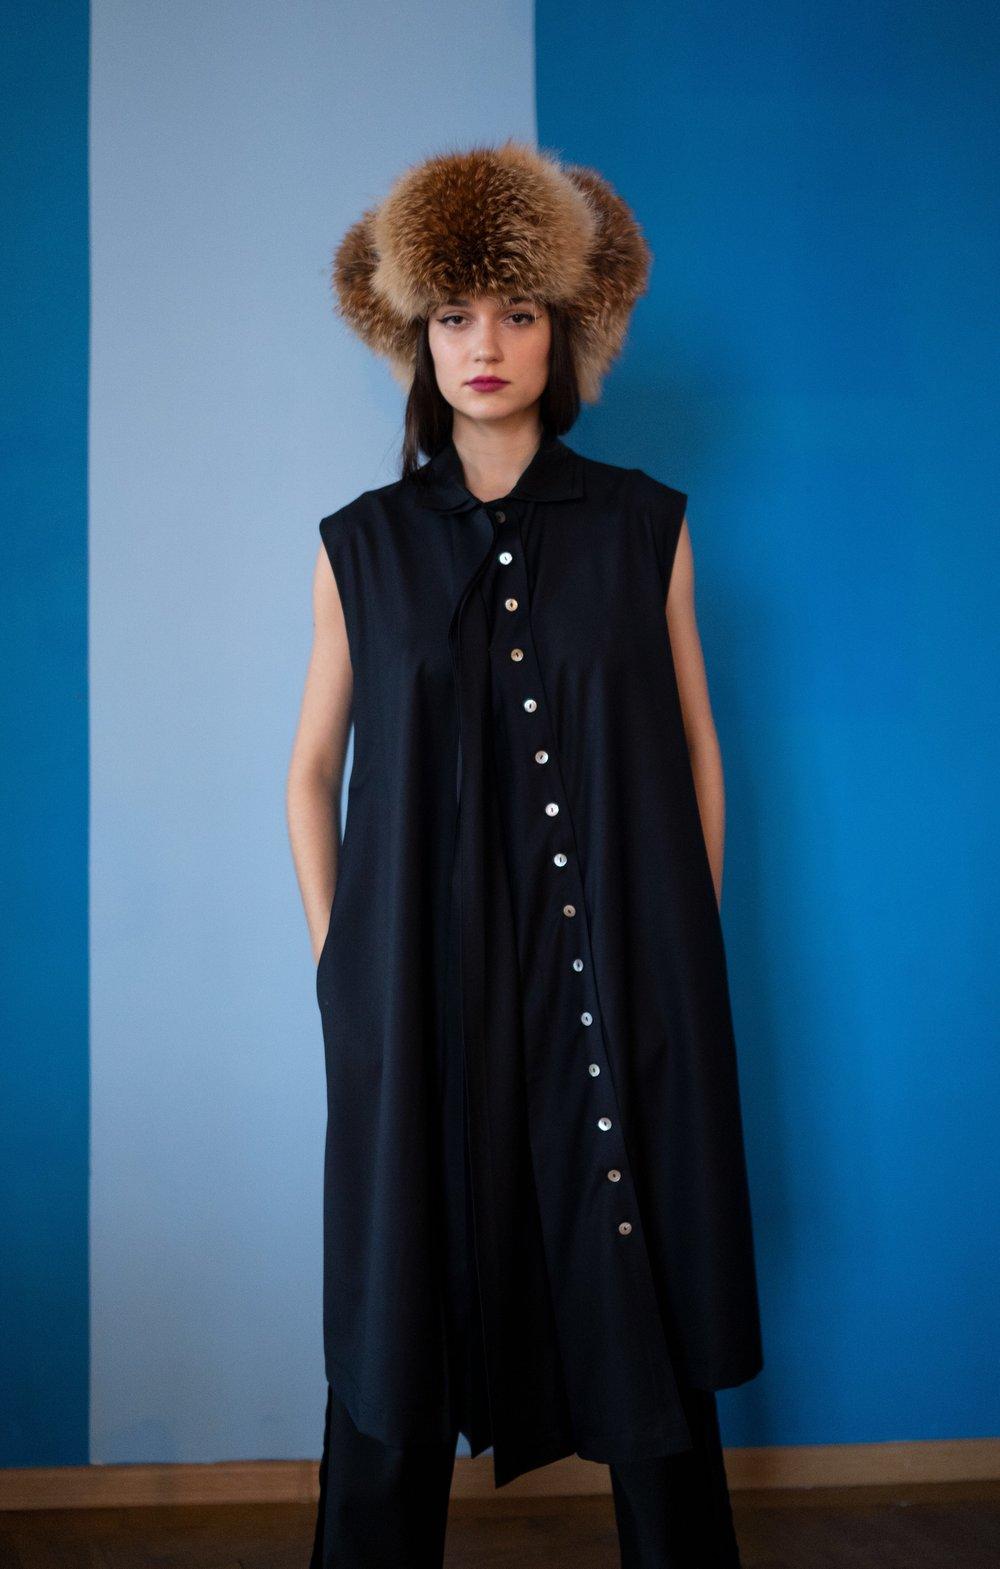 Image of Little black dress